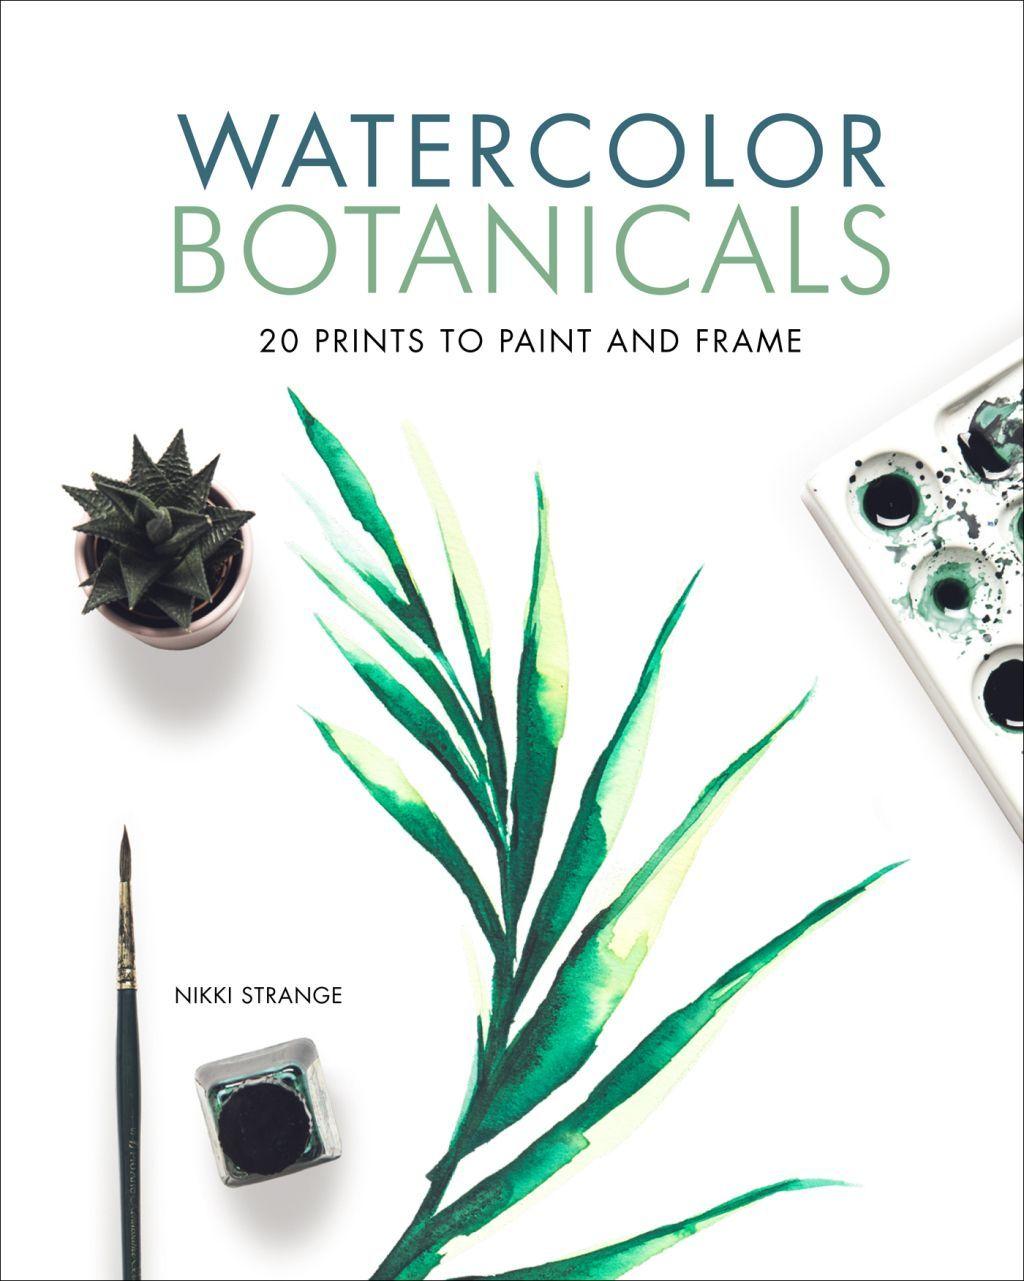 Watercolor Illustration Watercolor Botanicals Watercolor Art